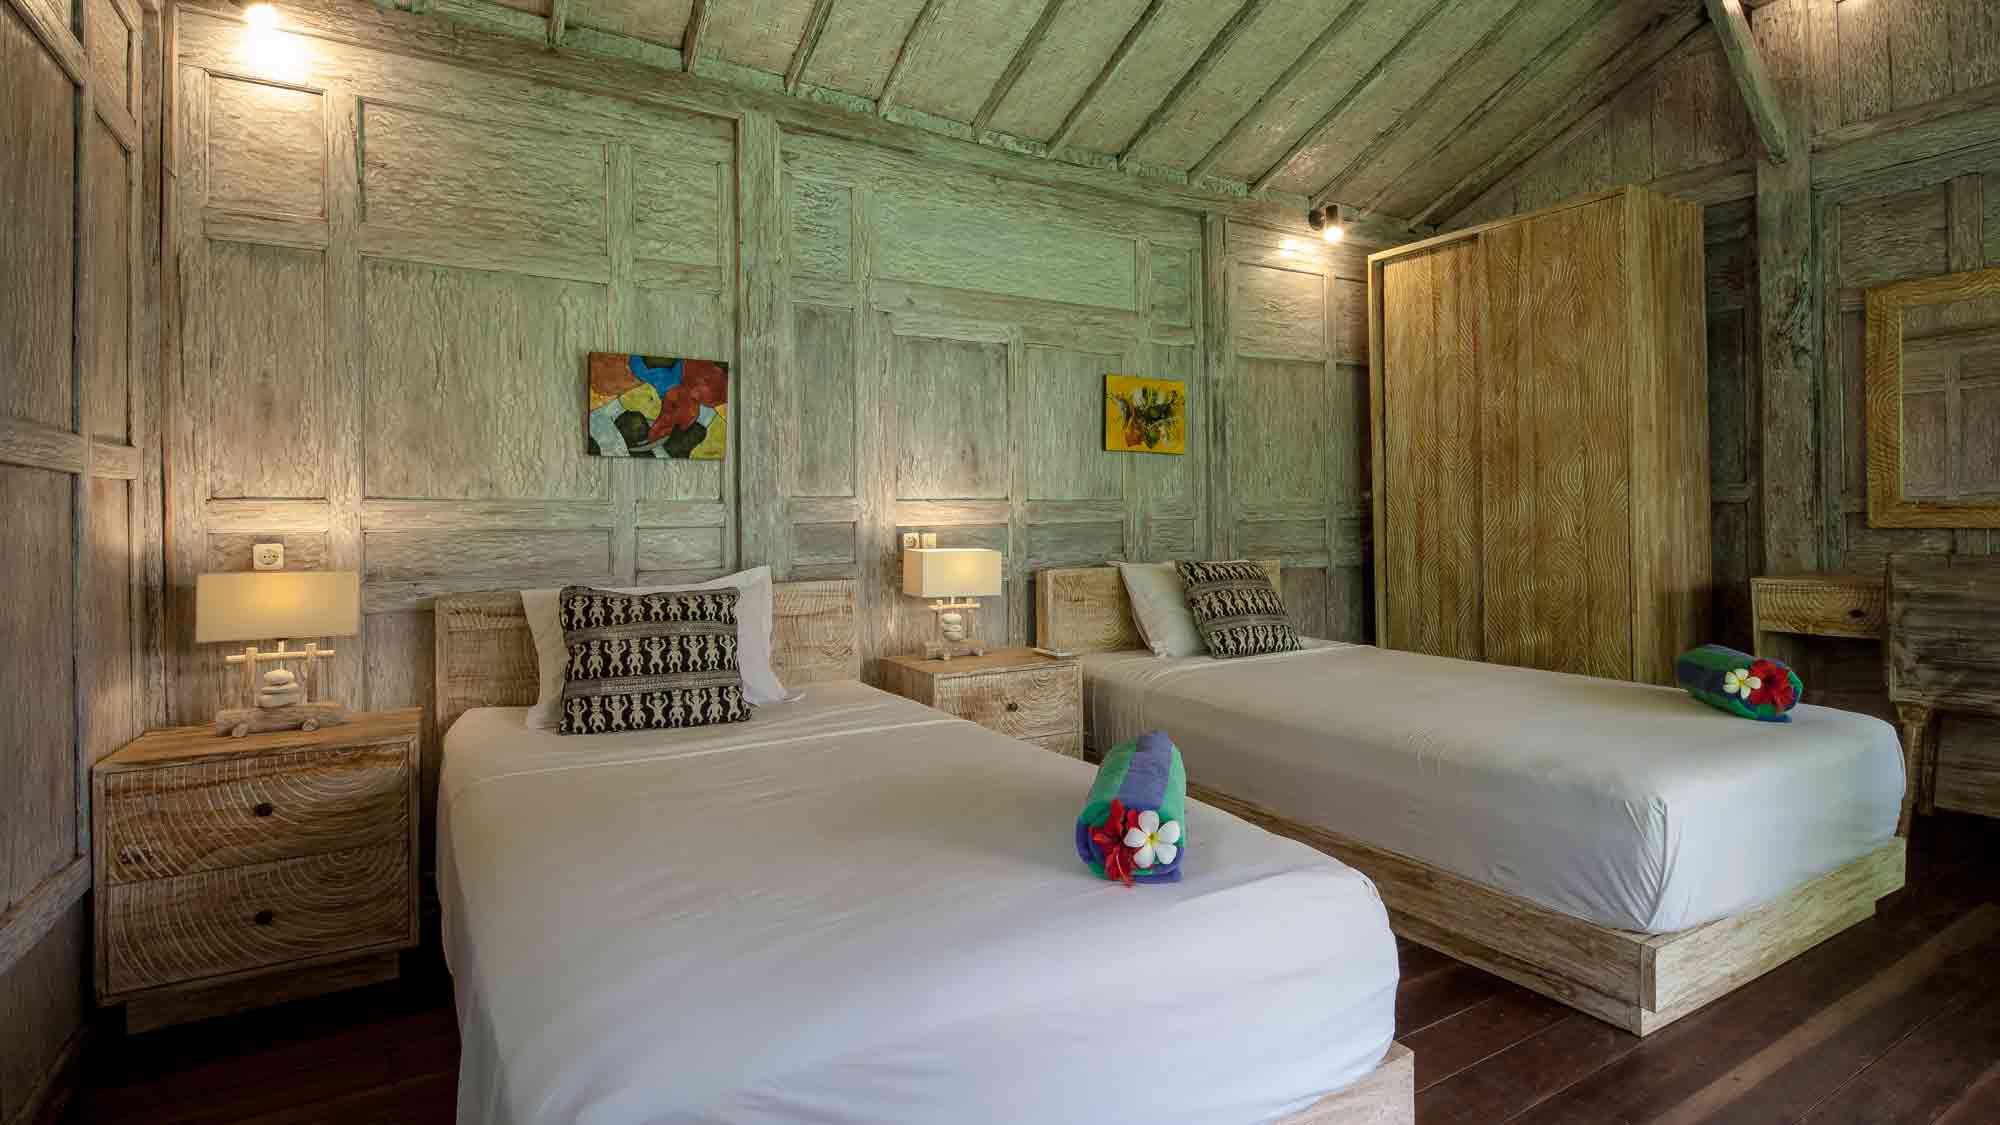 White Gladak room at Eat Sleep Skate Bali